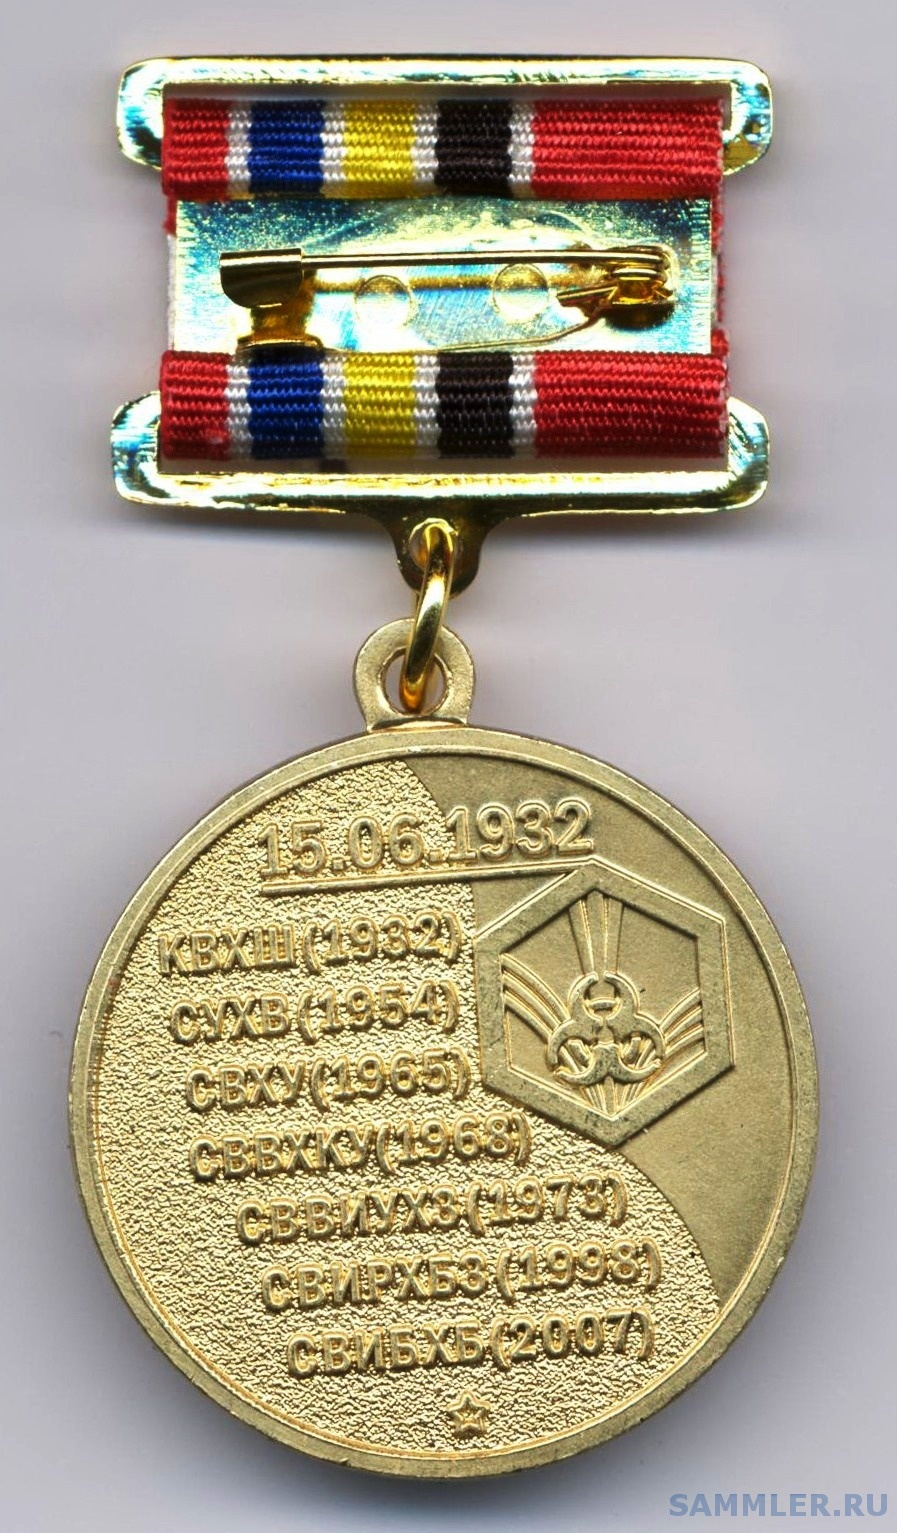 Медаль СВИРХБЗ 2.jpg